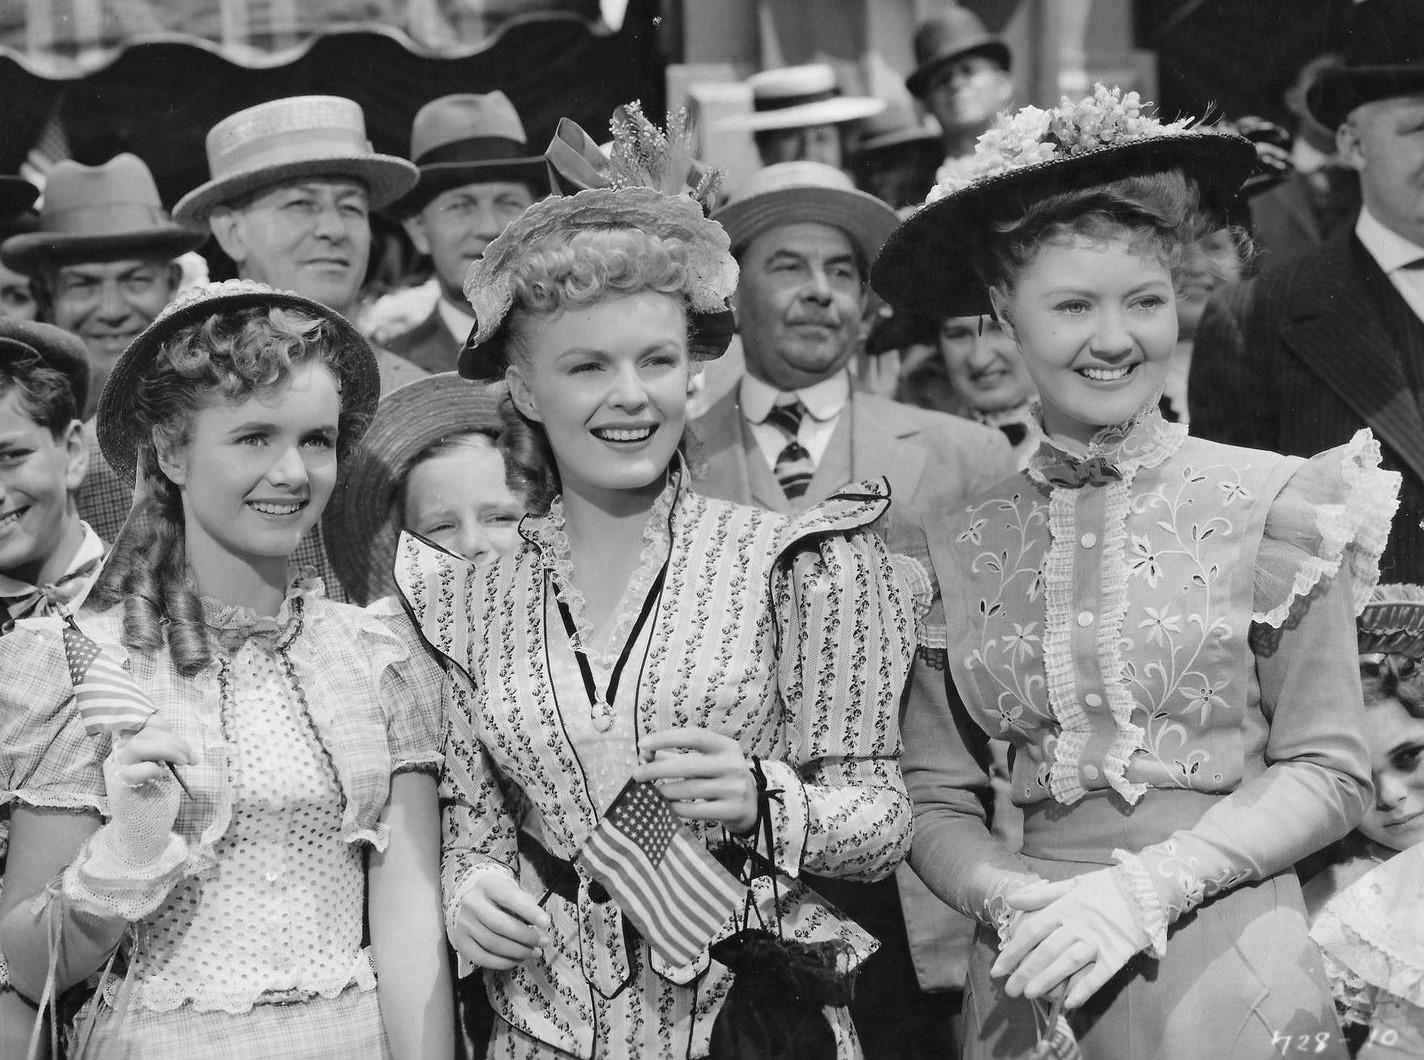 Debbie Reynolds, June Haver, and Marcia Mae Jones in The Daughter of Rosie O'Grady (1950)